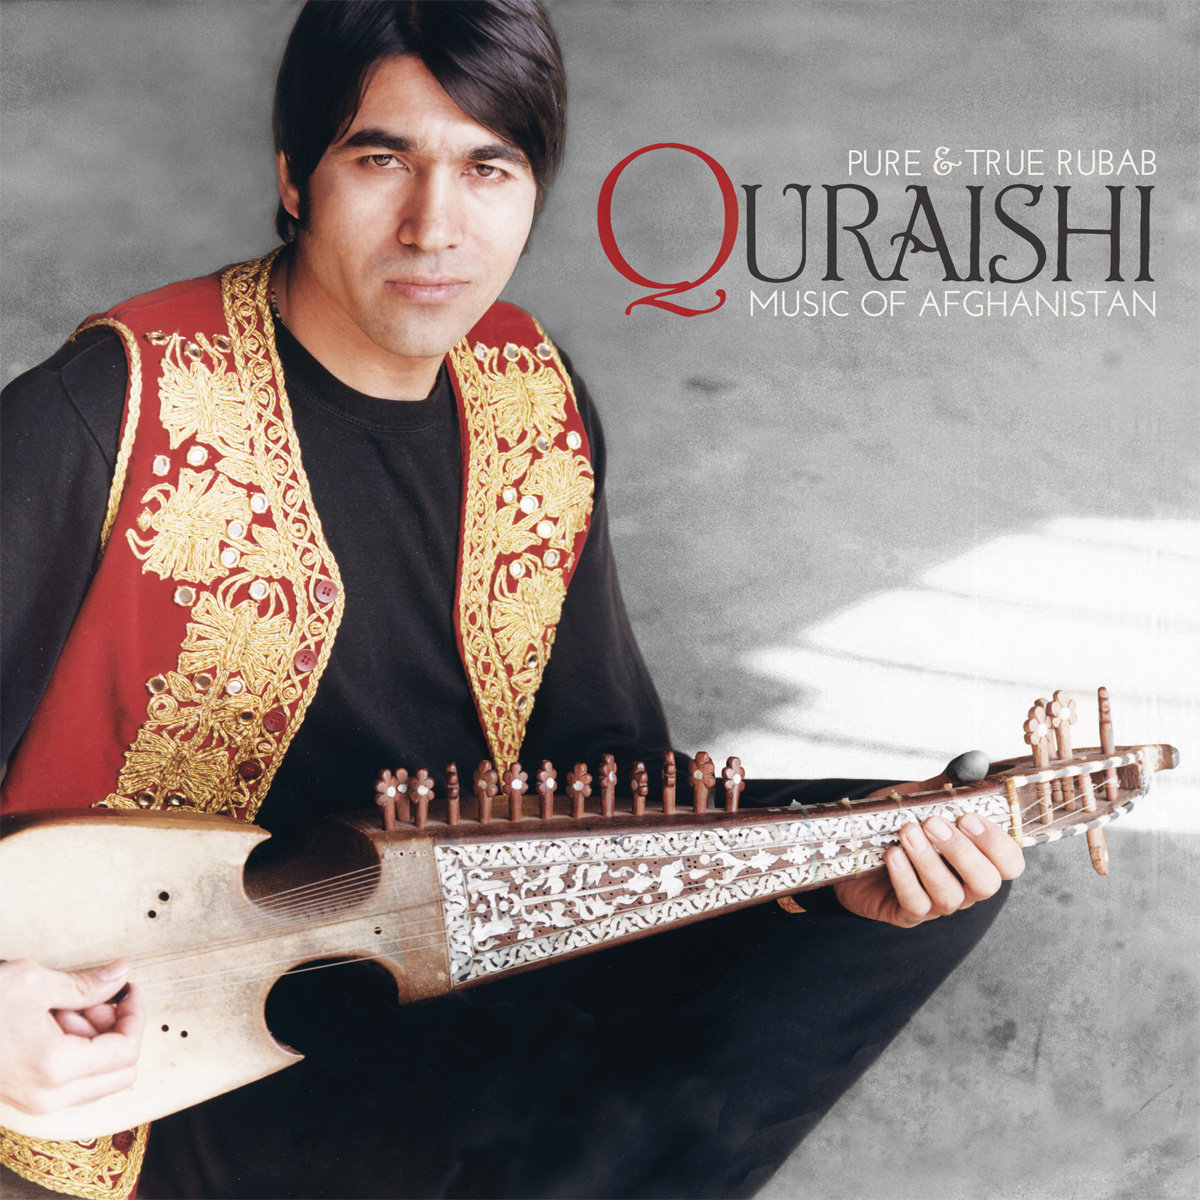 Pure & True Rubab: The Music of Afghanistan | Evergreene Music